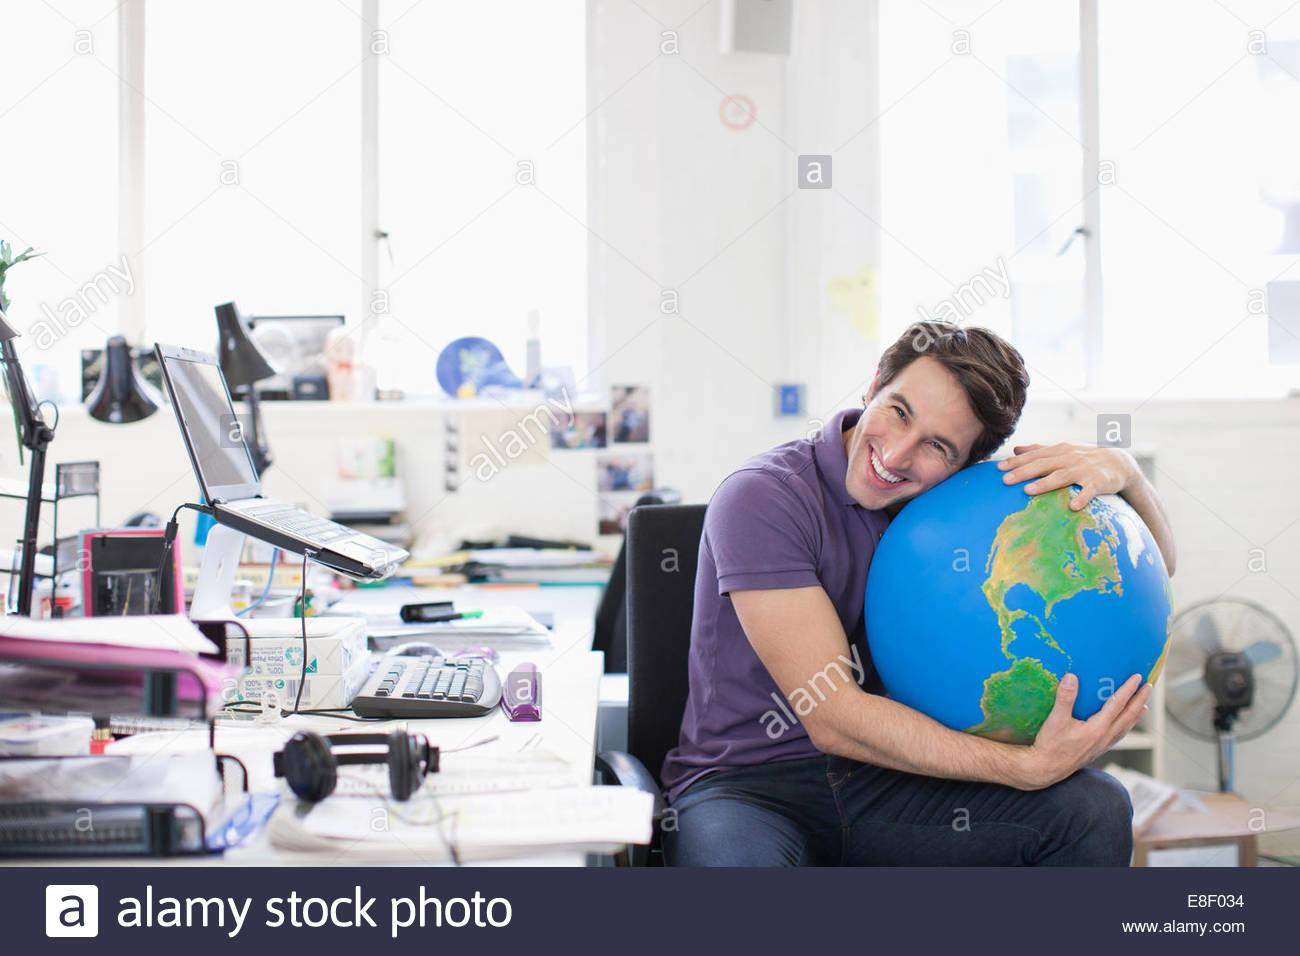 Smiling businessman hugging globe at desk in office - Stock Image